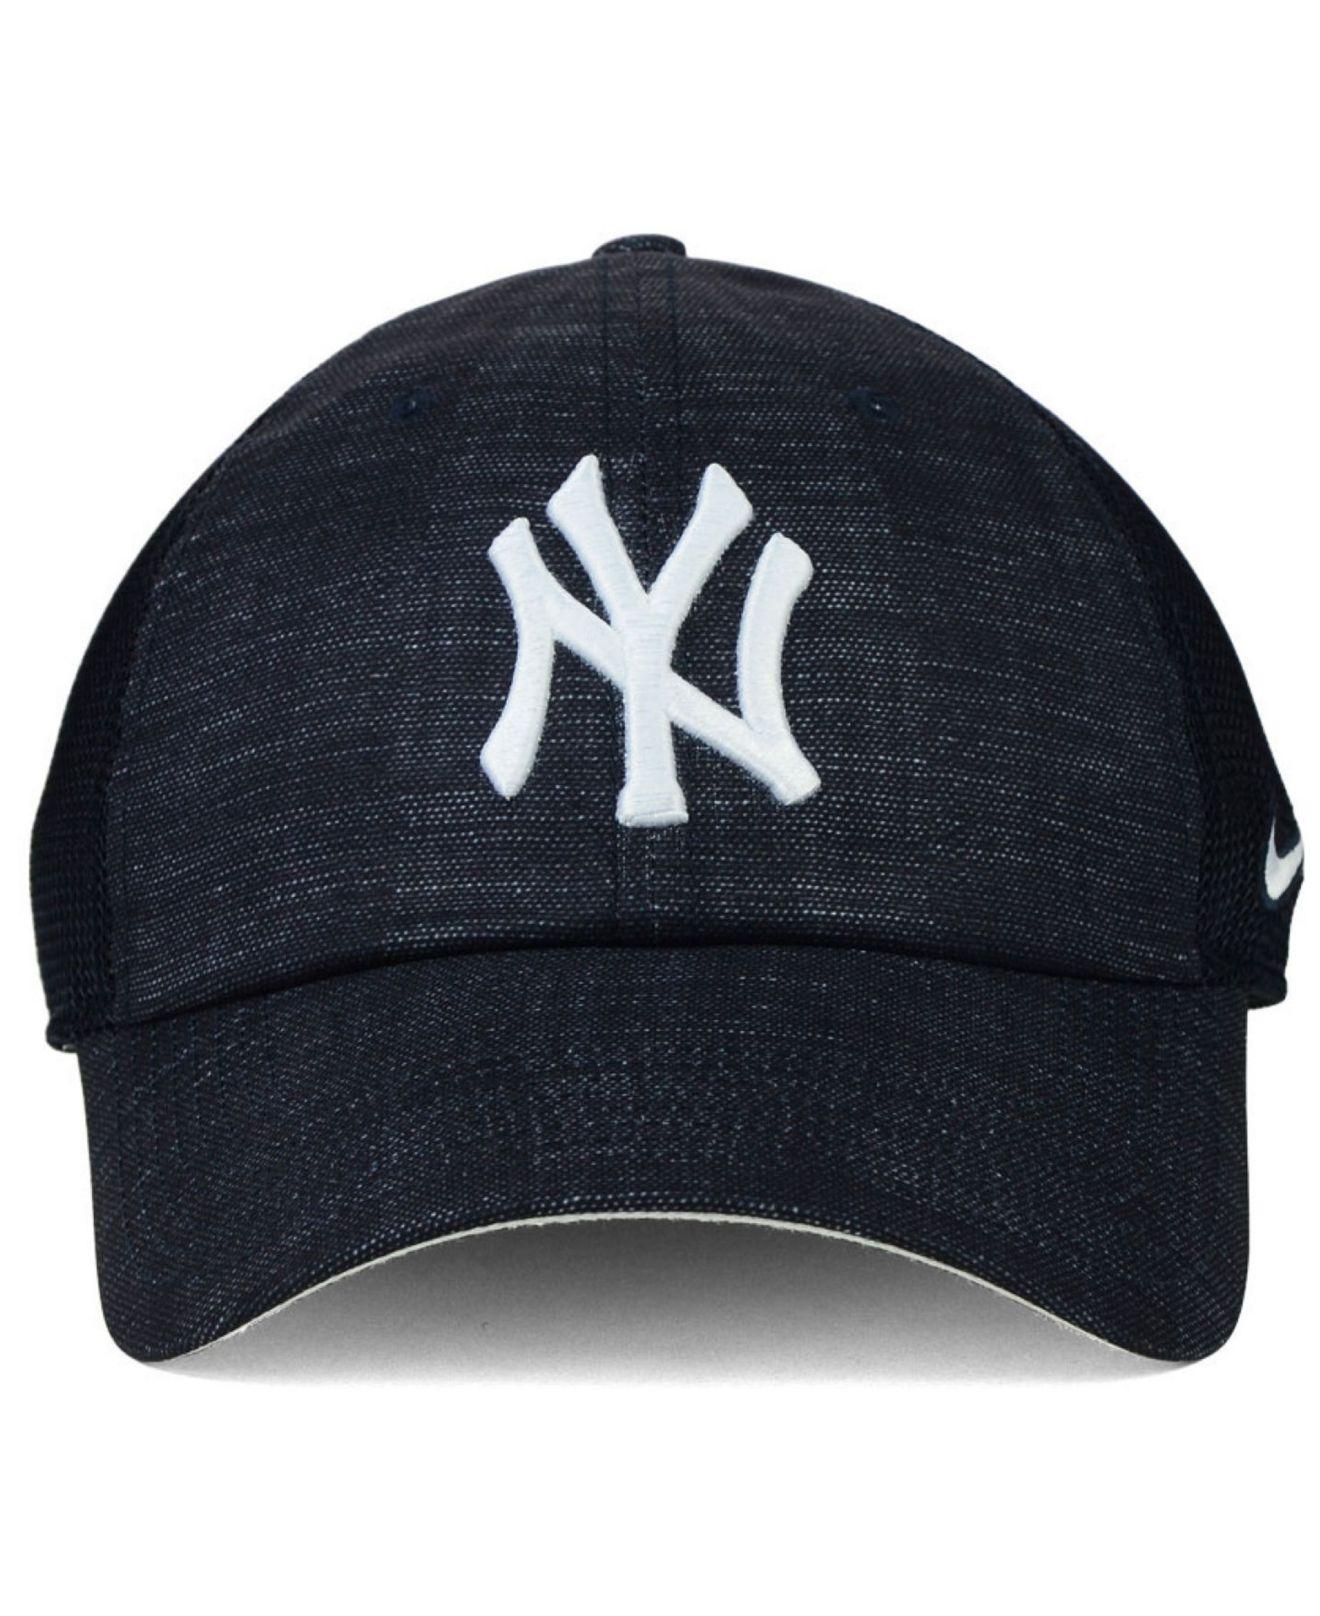 nike new york yankees dri fit adjustable cap in blue for. Black Bedroom Furniture Sets. Home Design Ideas